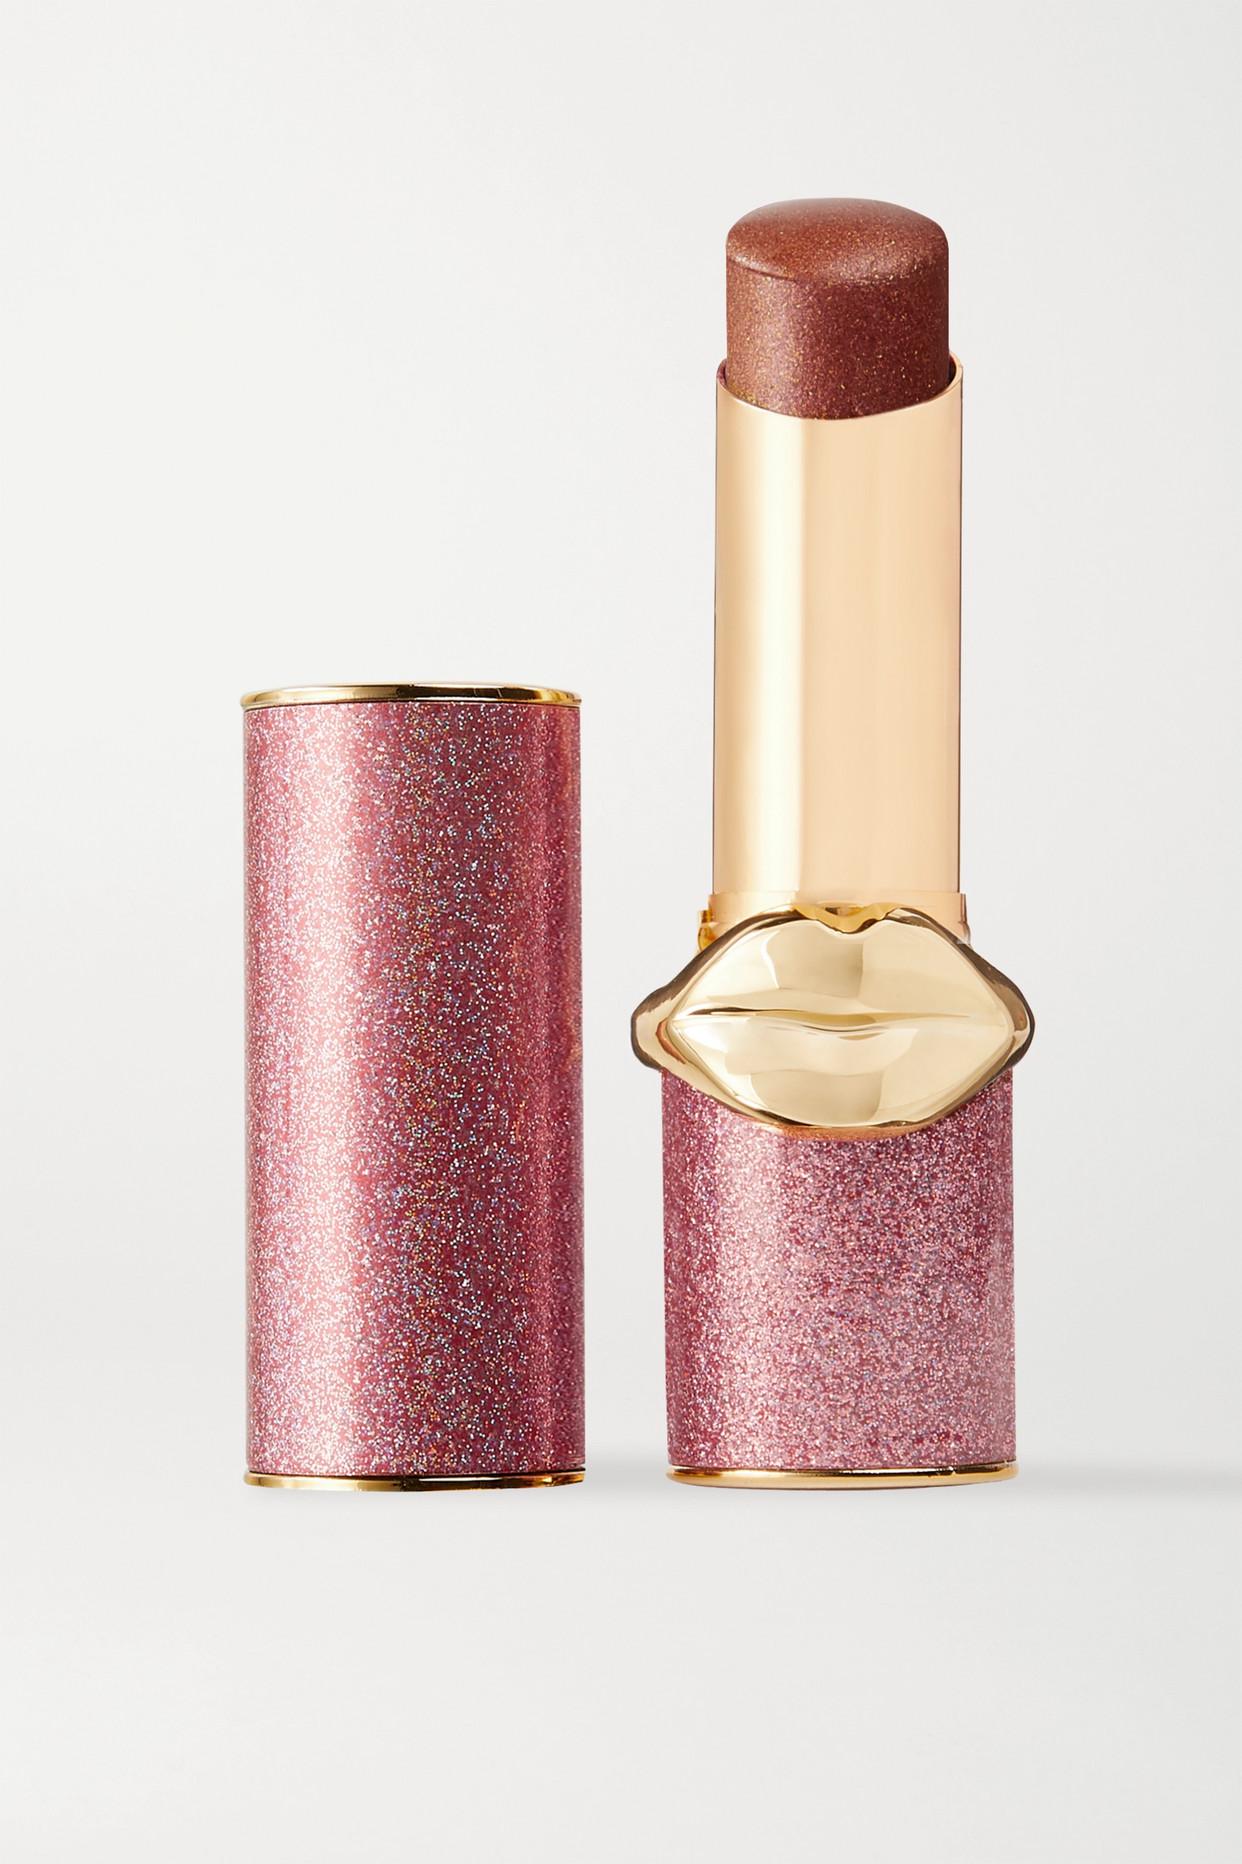 PAT MCGRATH LABS - Lip Fetish Astral Lip Balm - Bronze - Metallic - one size